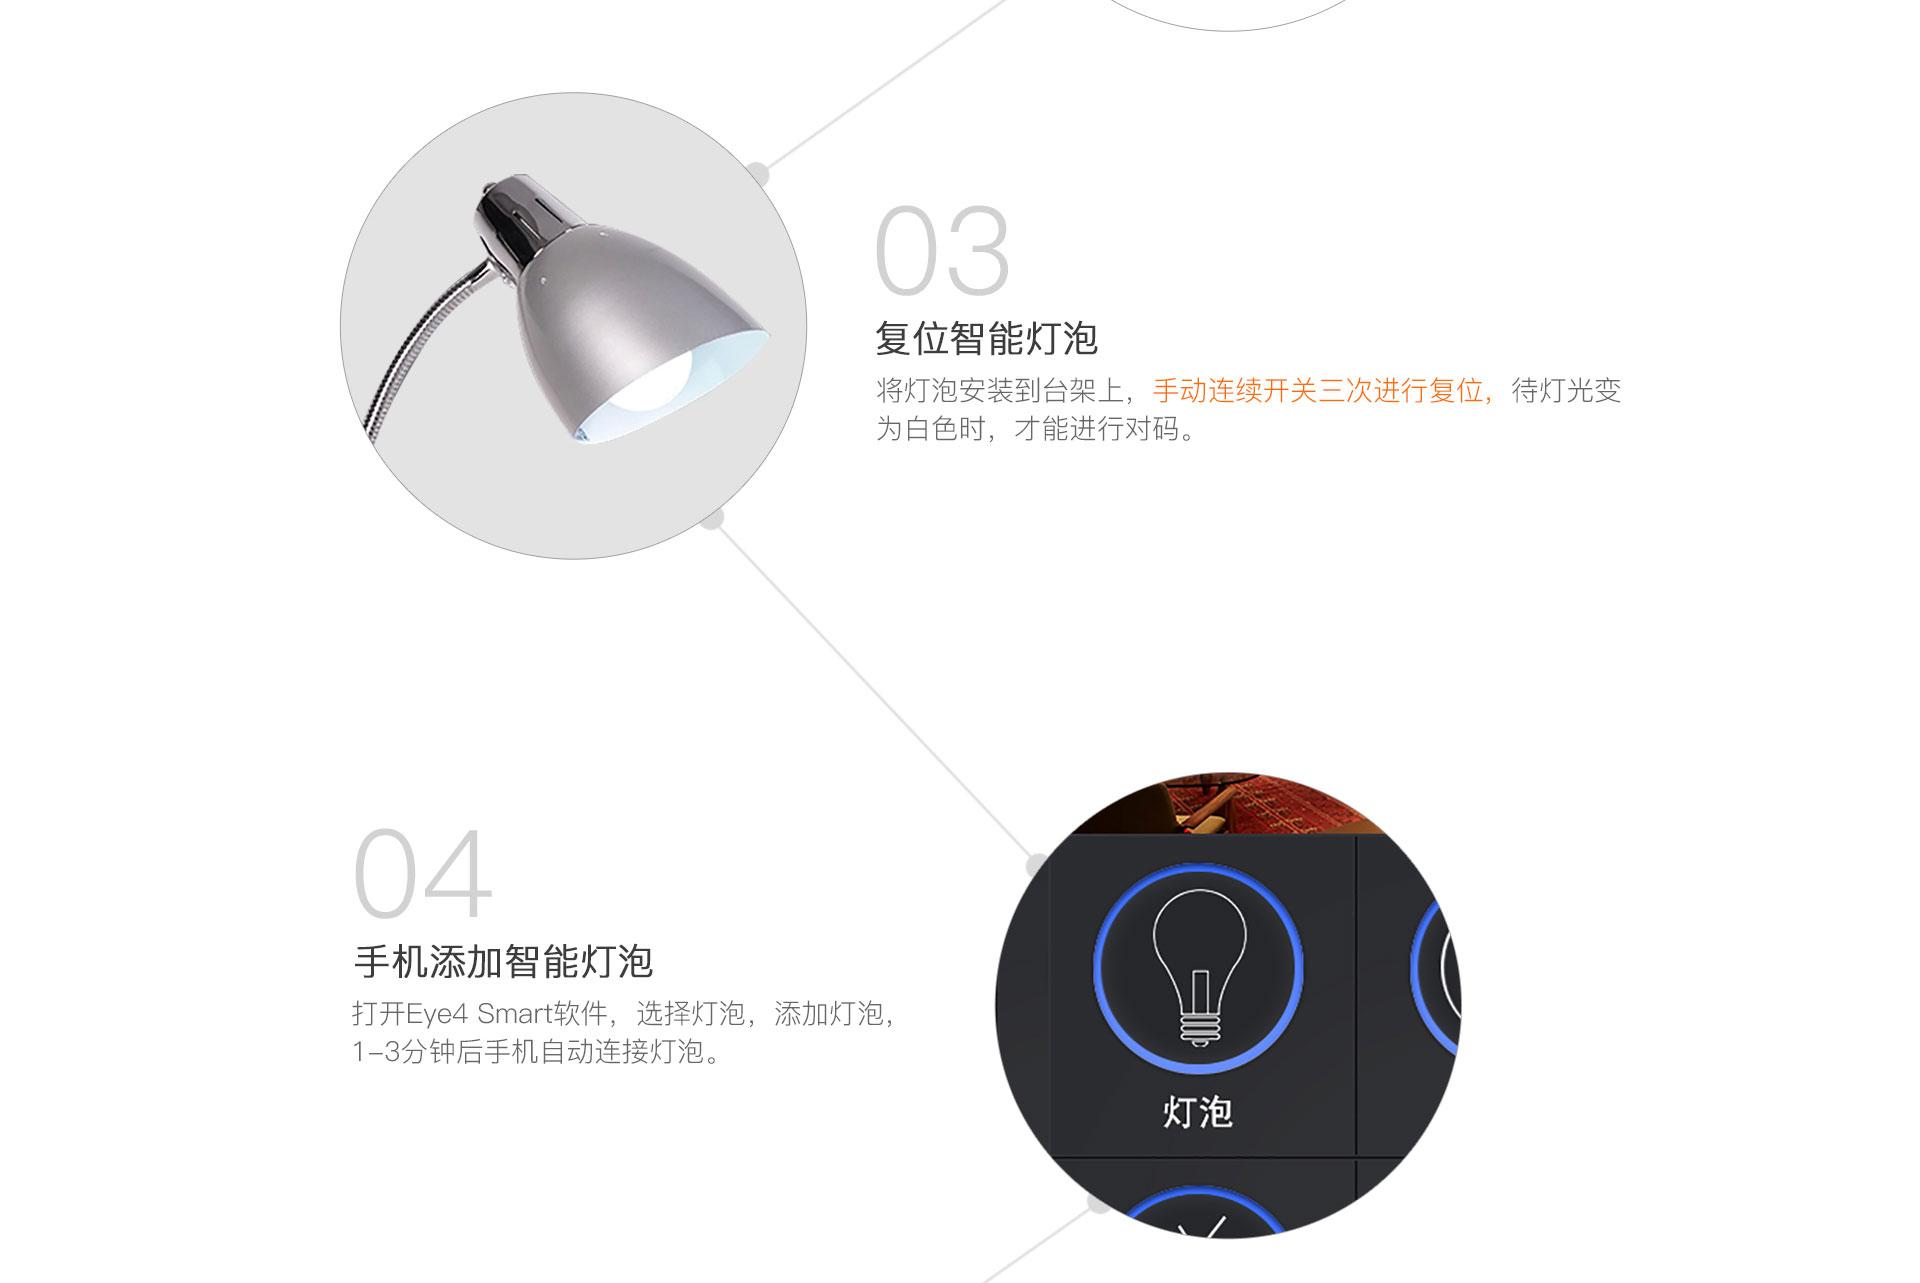 WB1无线WiFi智能灯泡